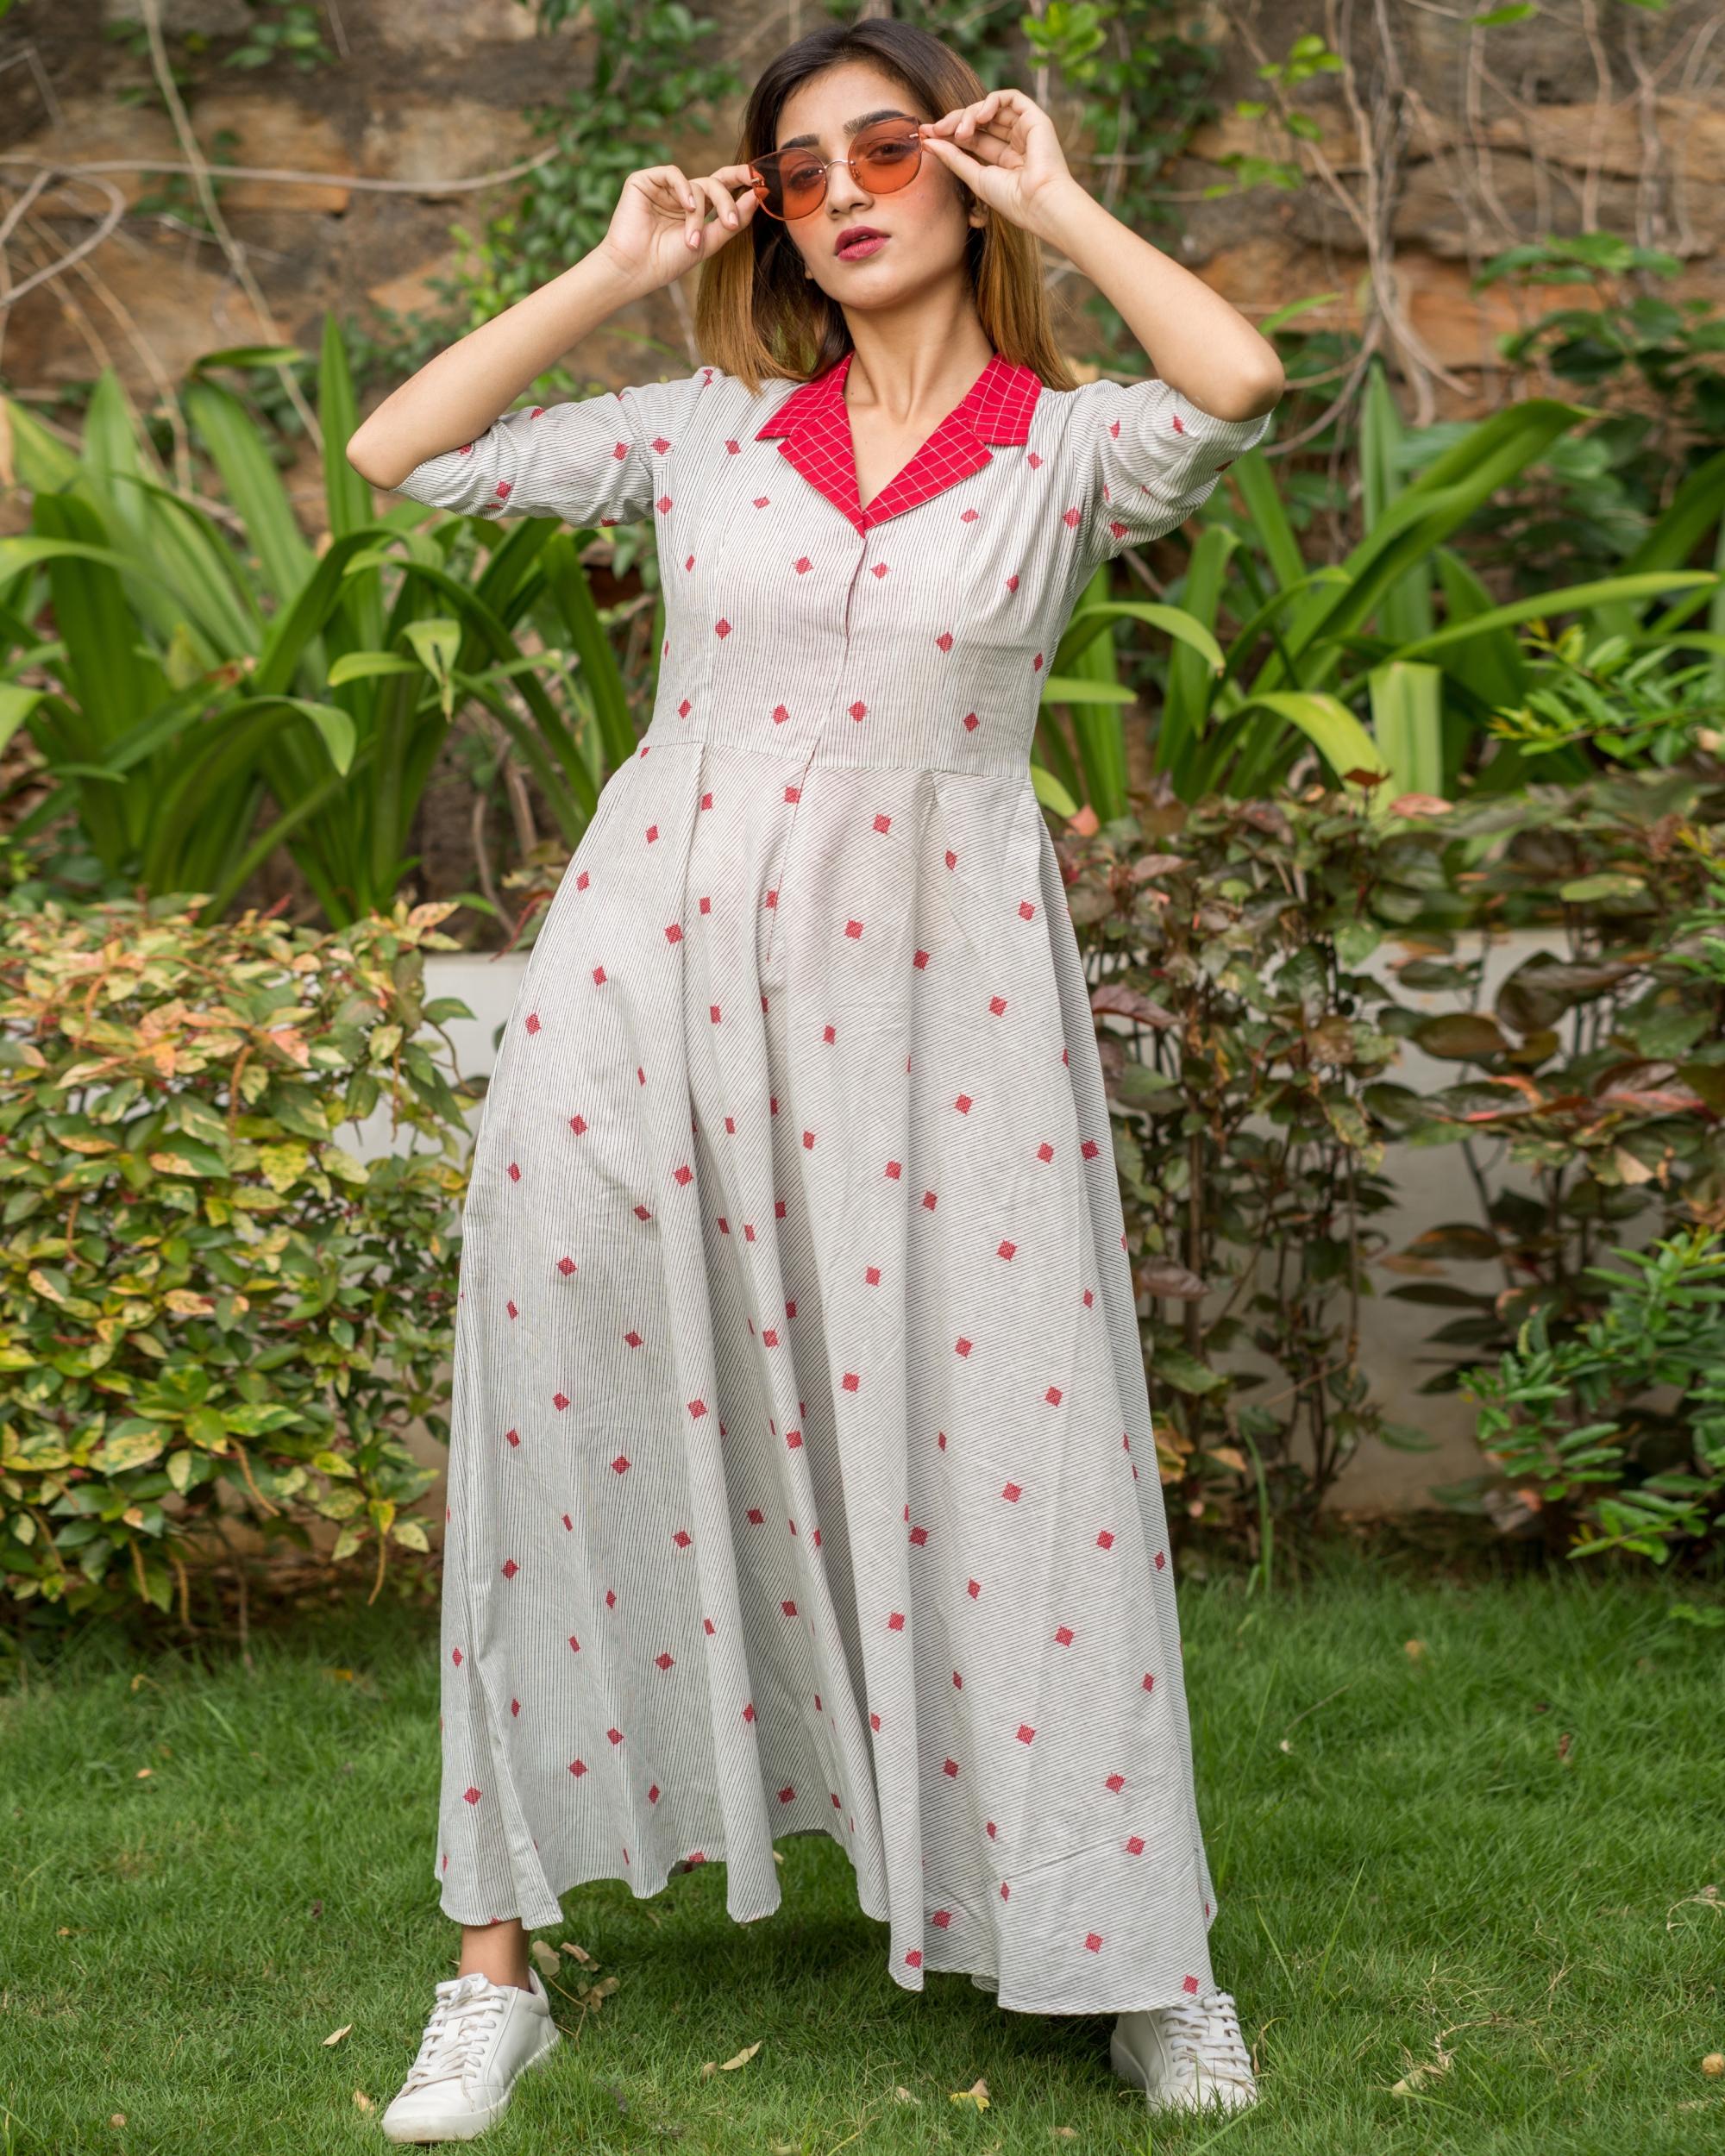 White checkered collar dress